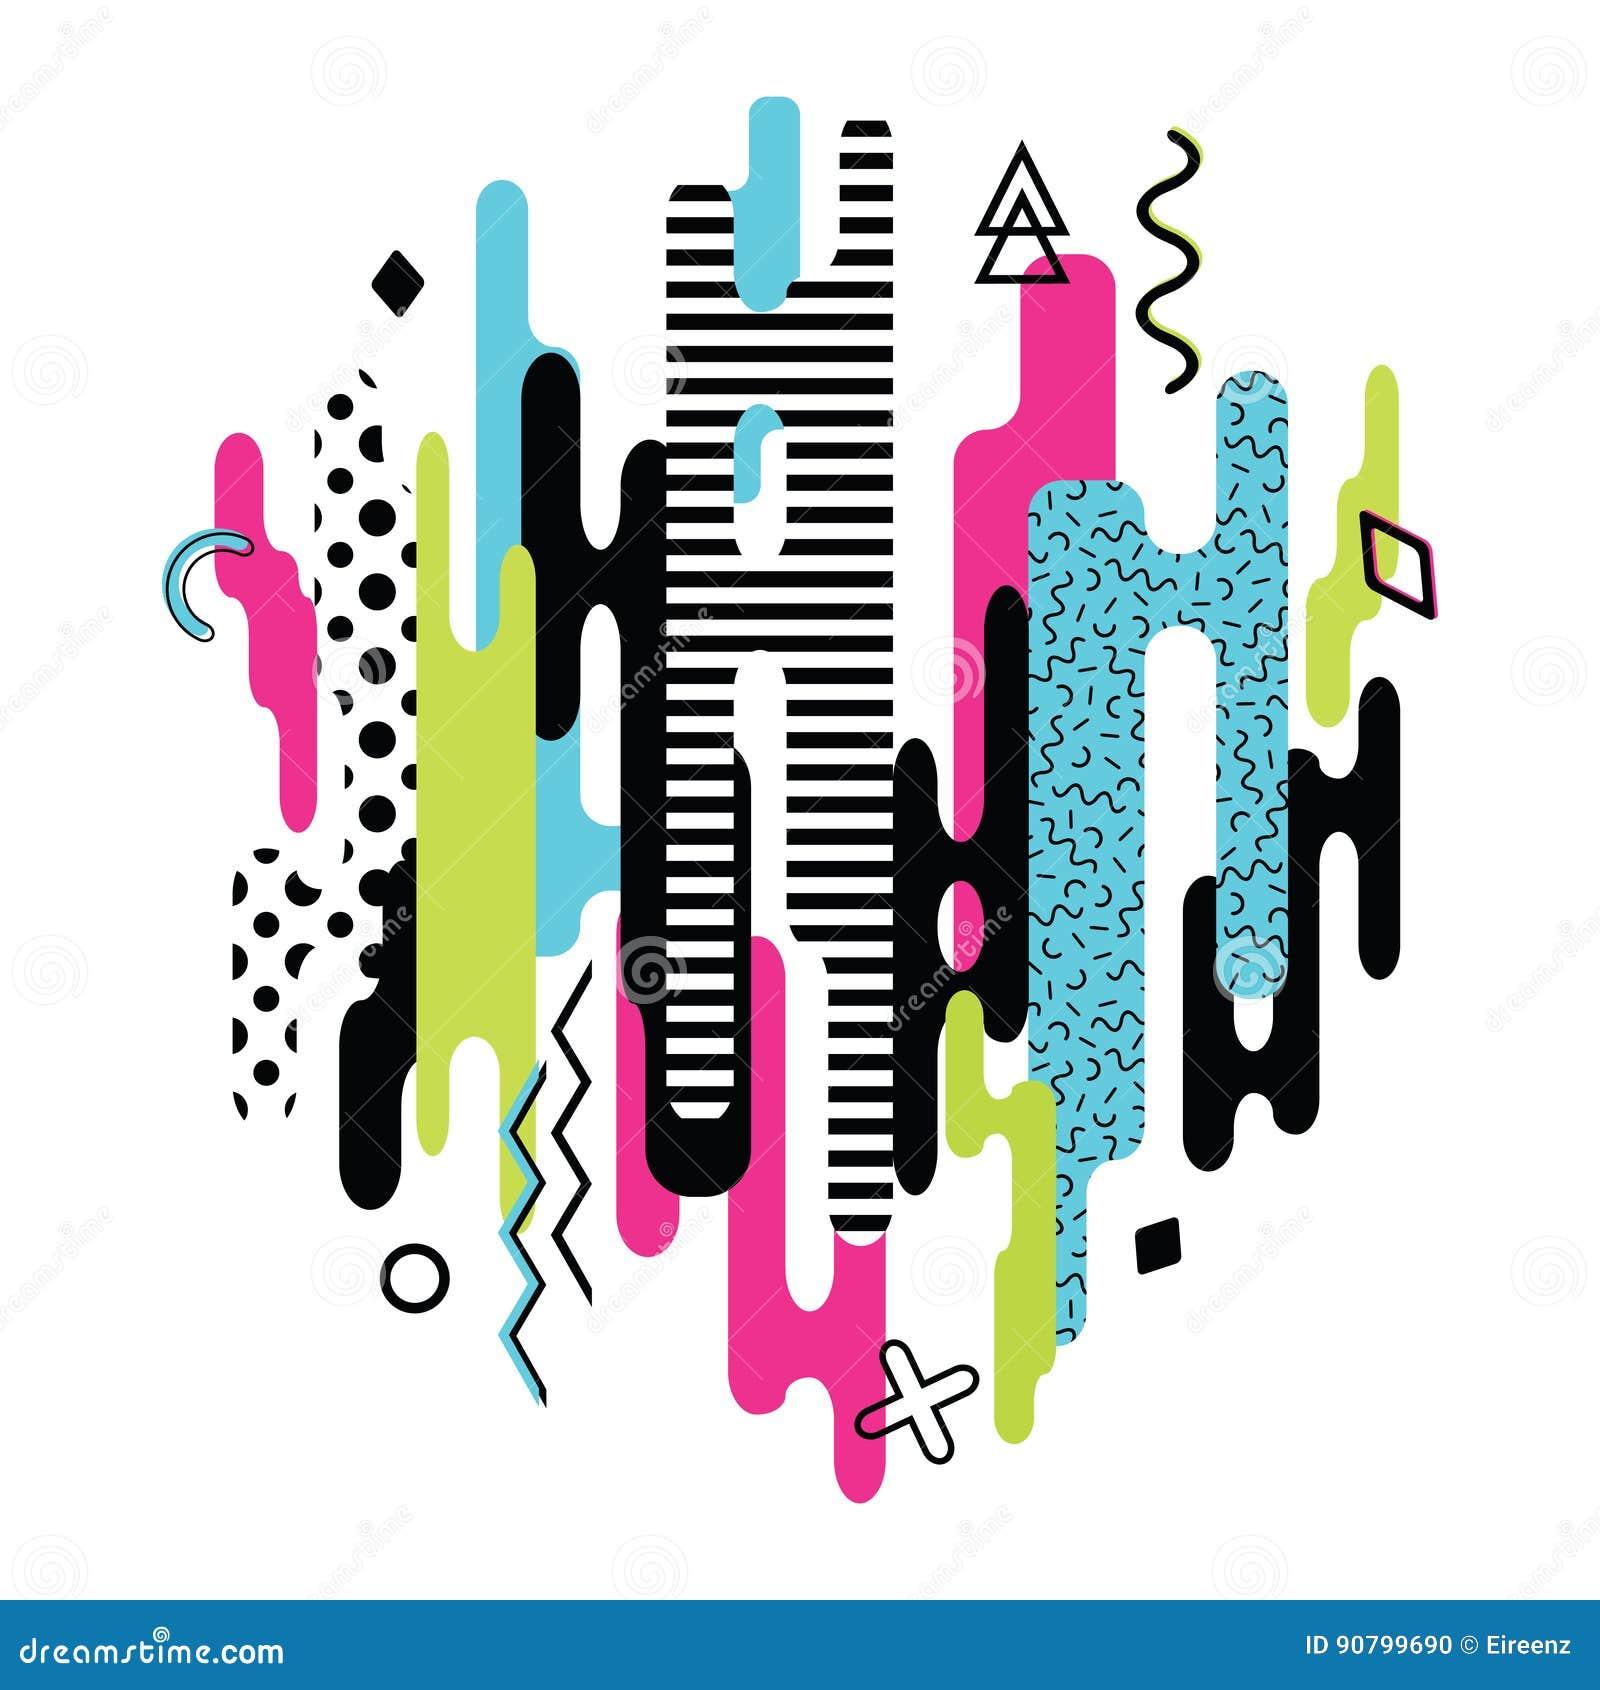 Vector la composición dinámica moderna hecha de diversas formas redondeadas